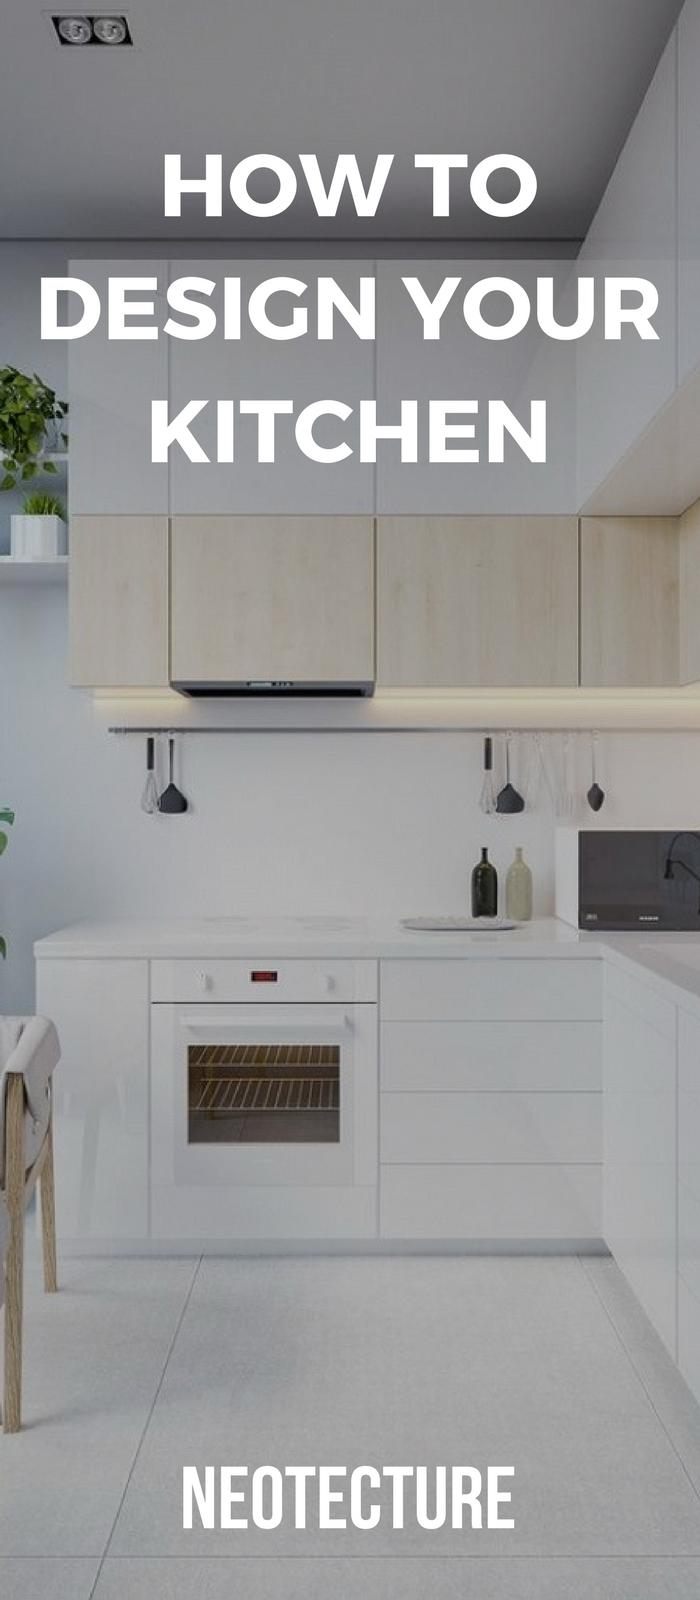 How to design a kitchen .jpg